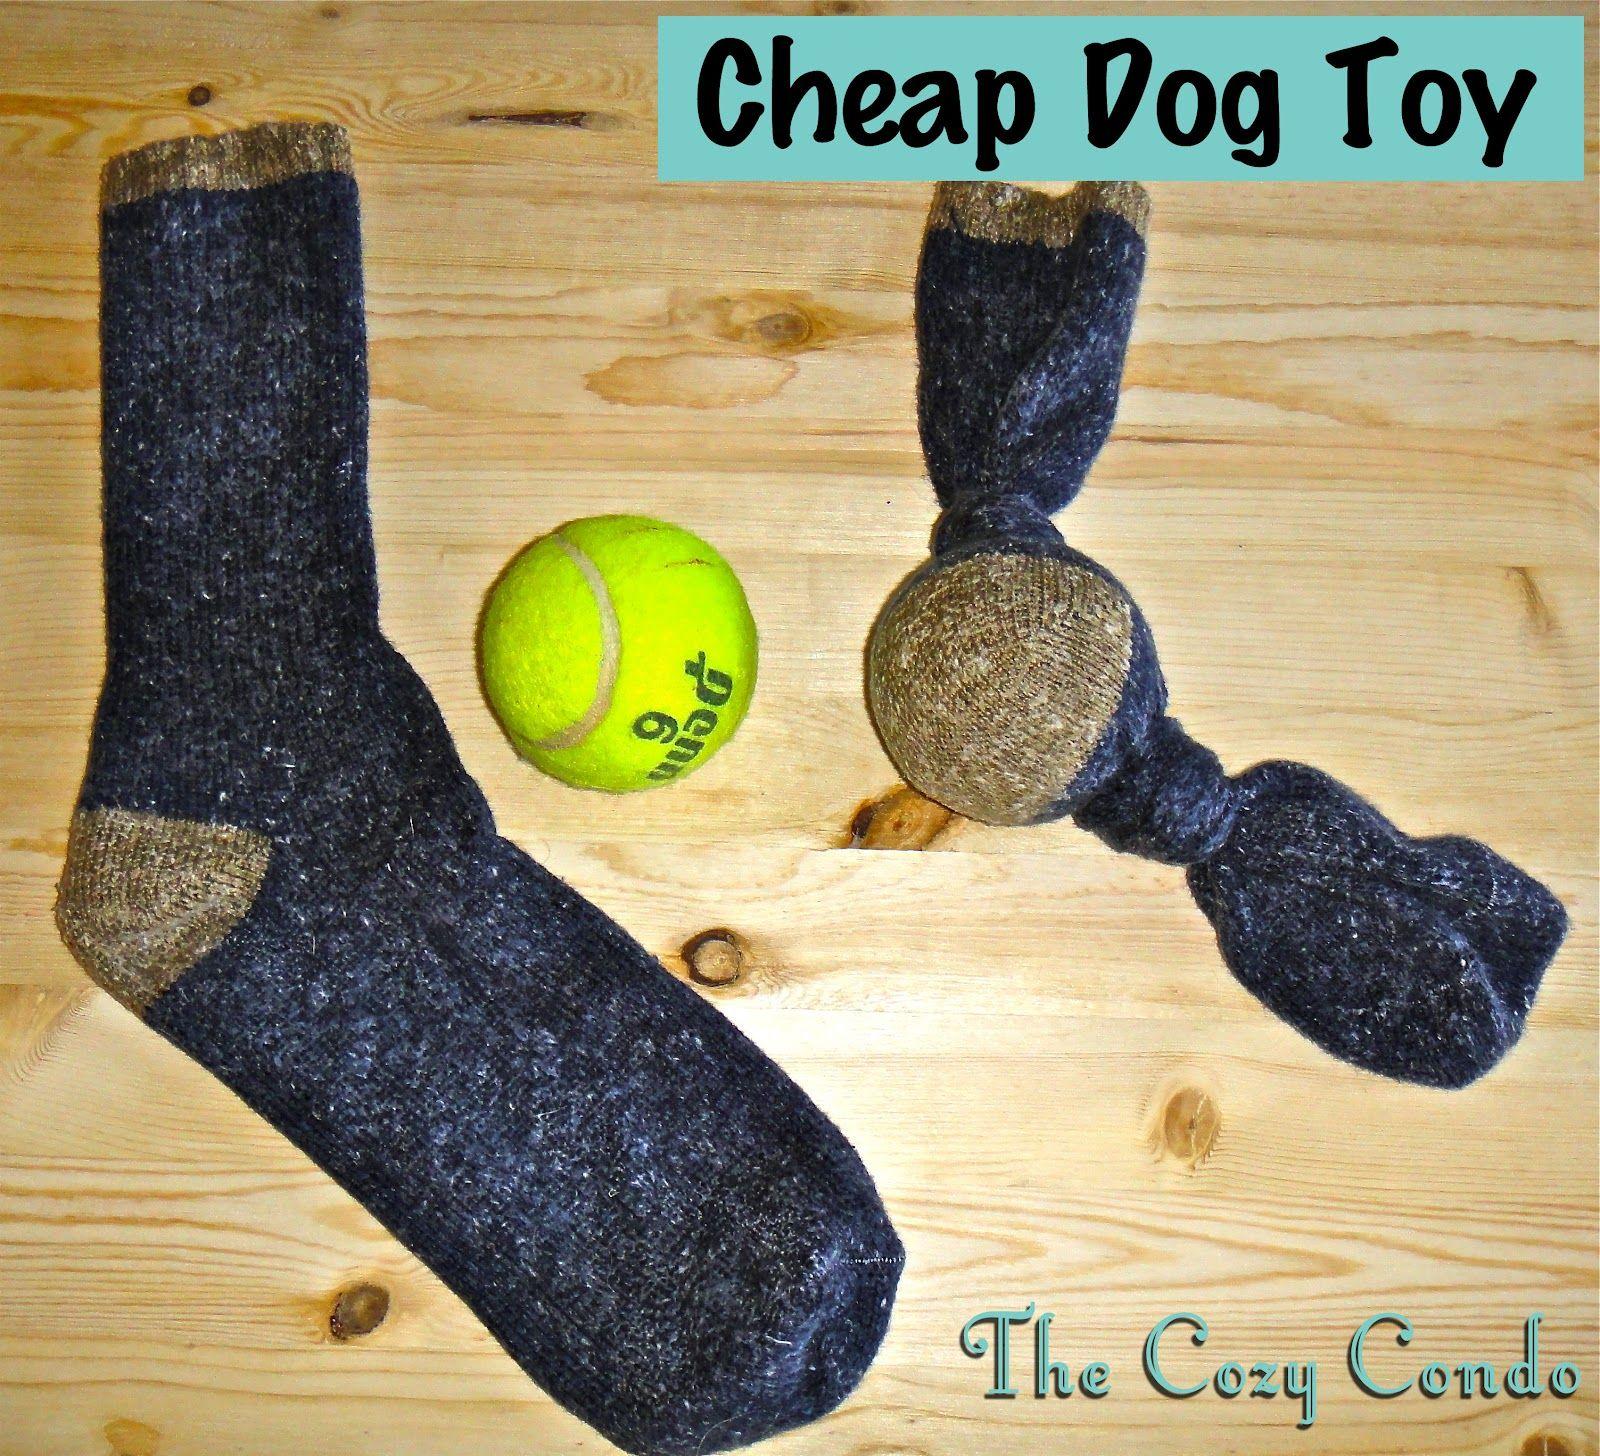 Cheap Dog Toy Cheap Dog Toys